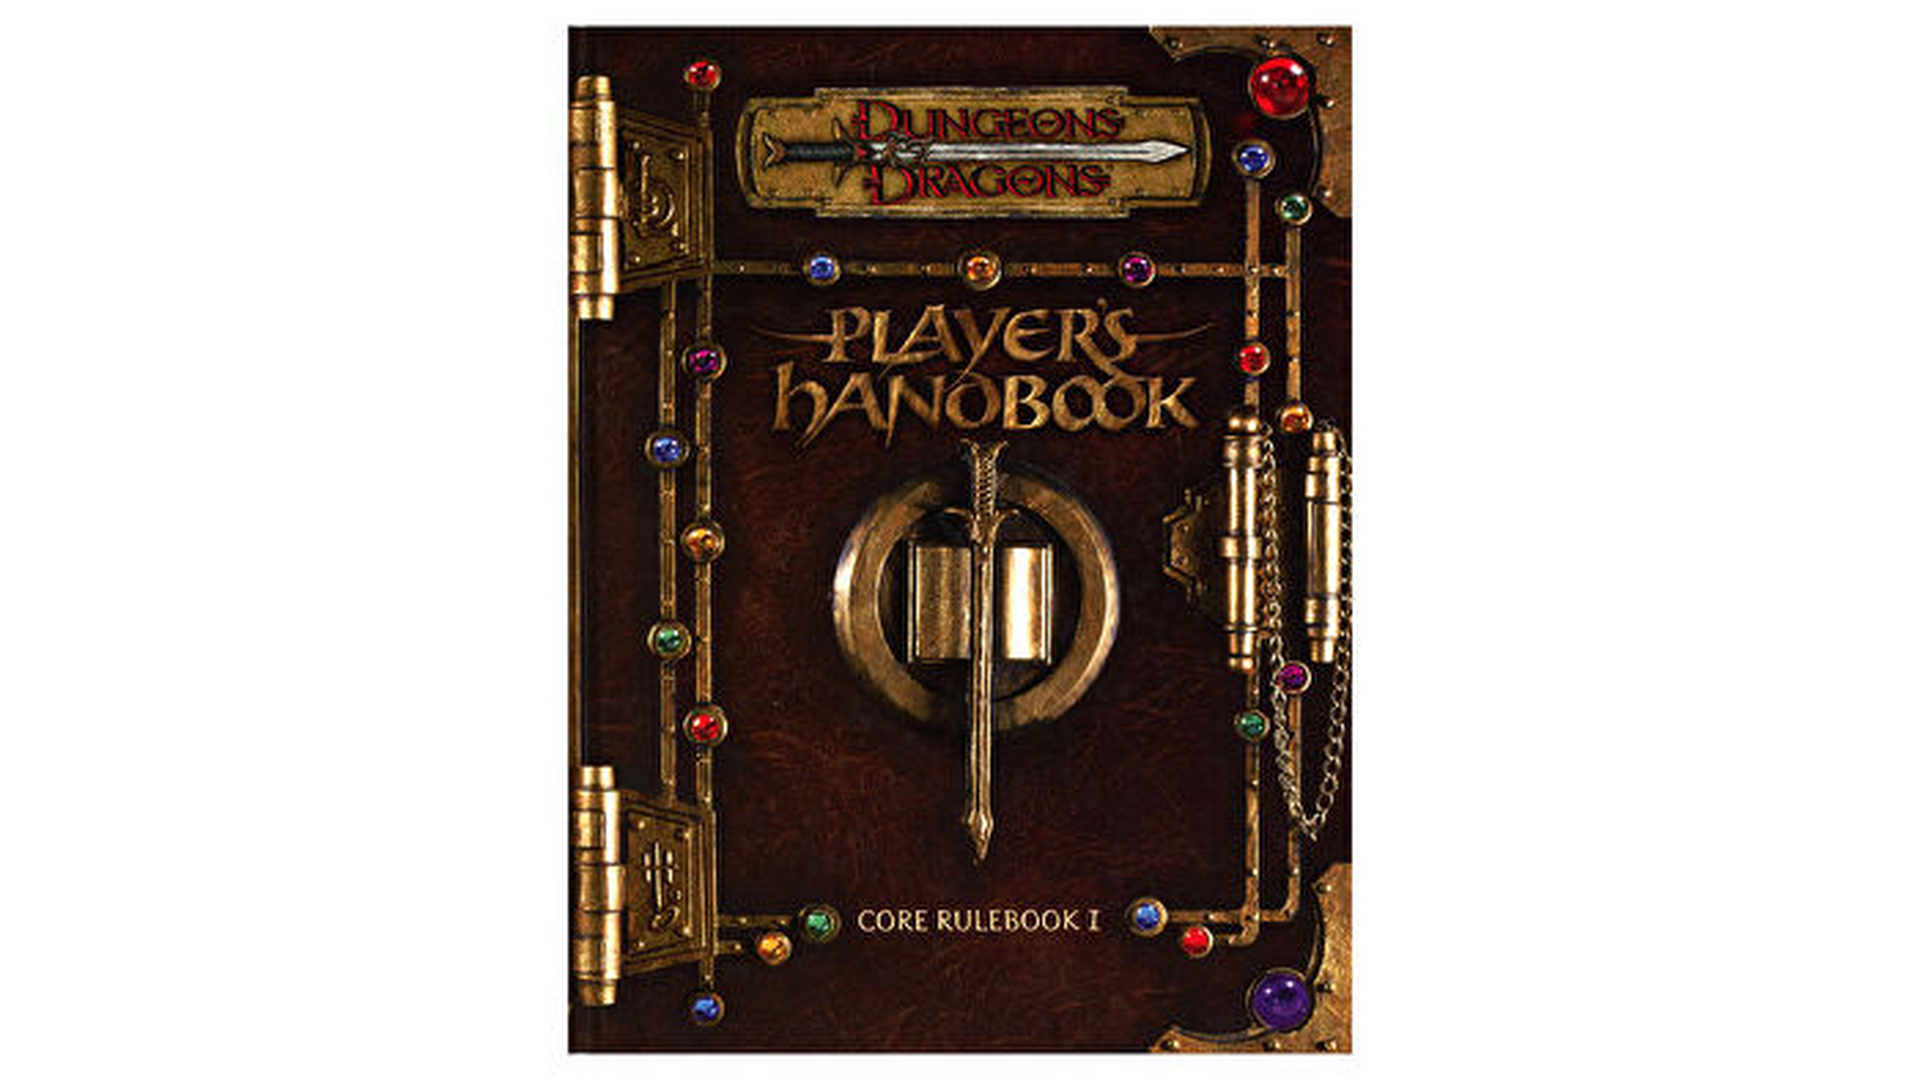 dungeons-and-dragons-third-edition-players-handbook.jpg